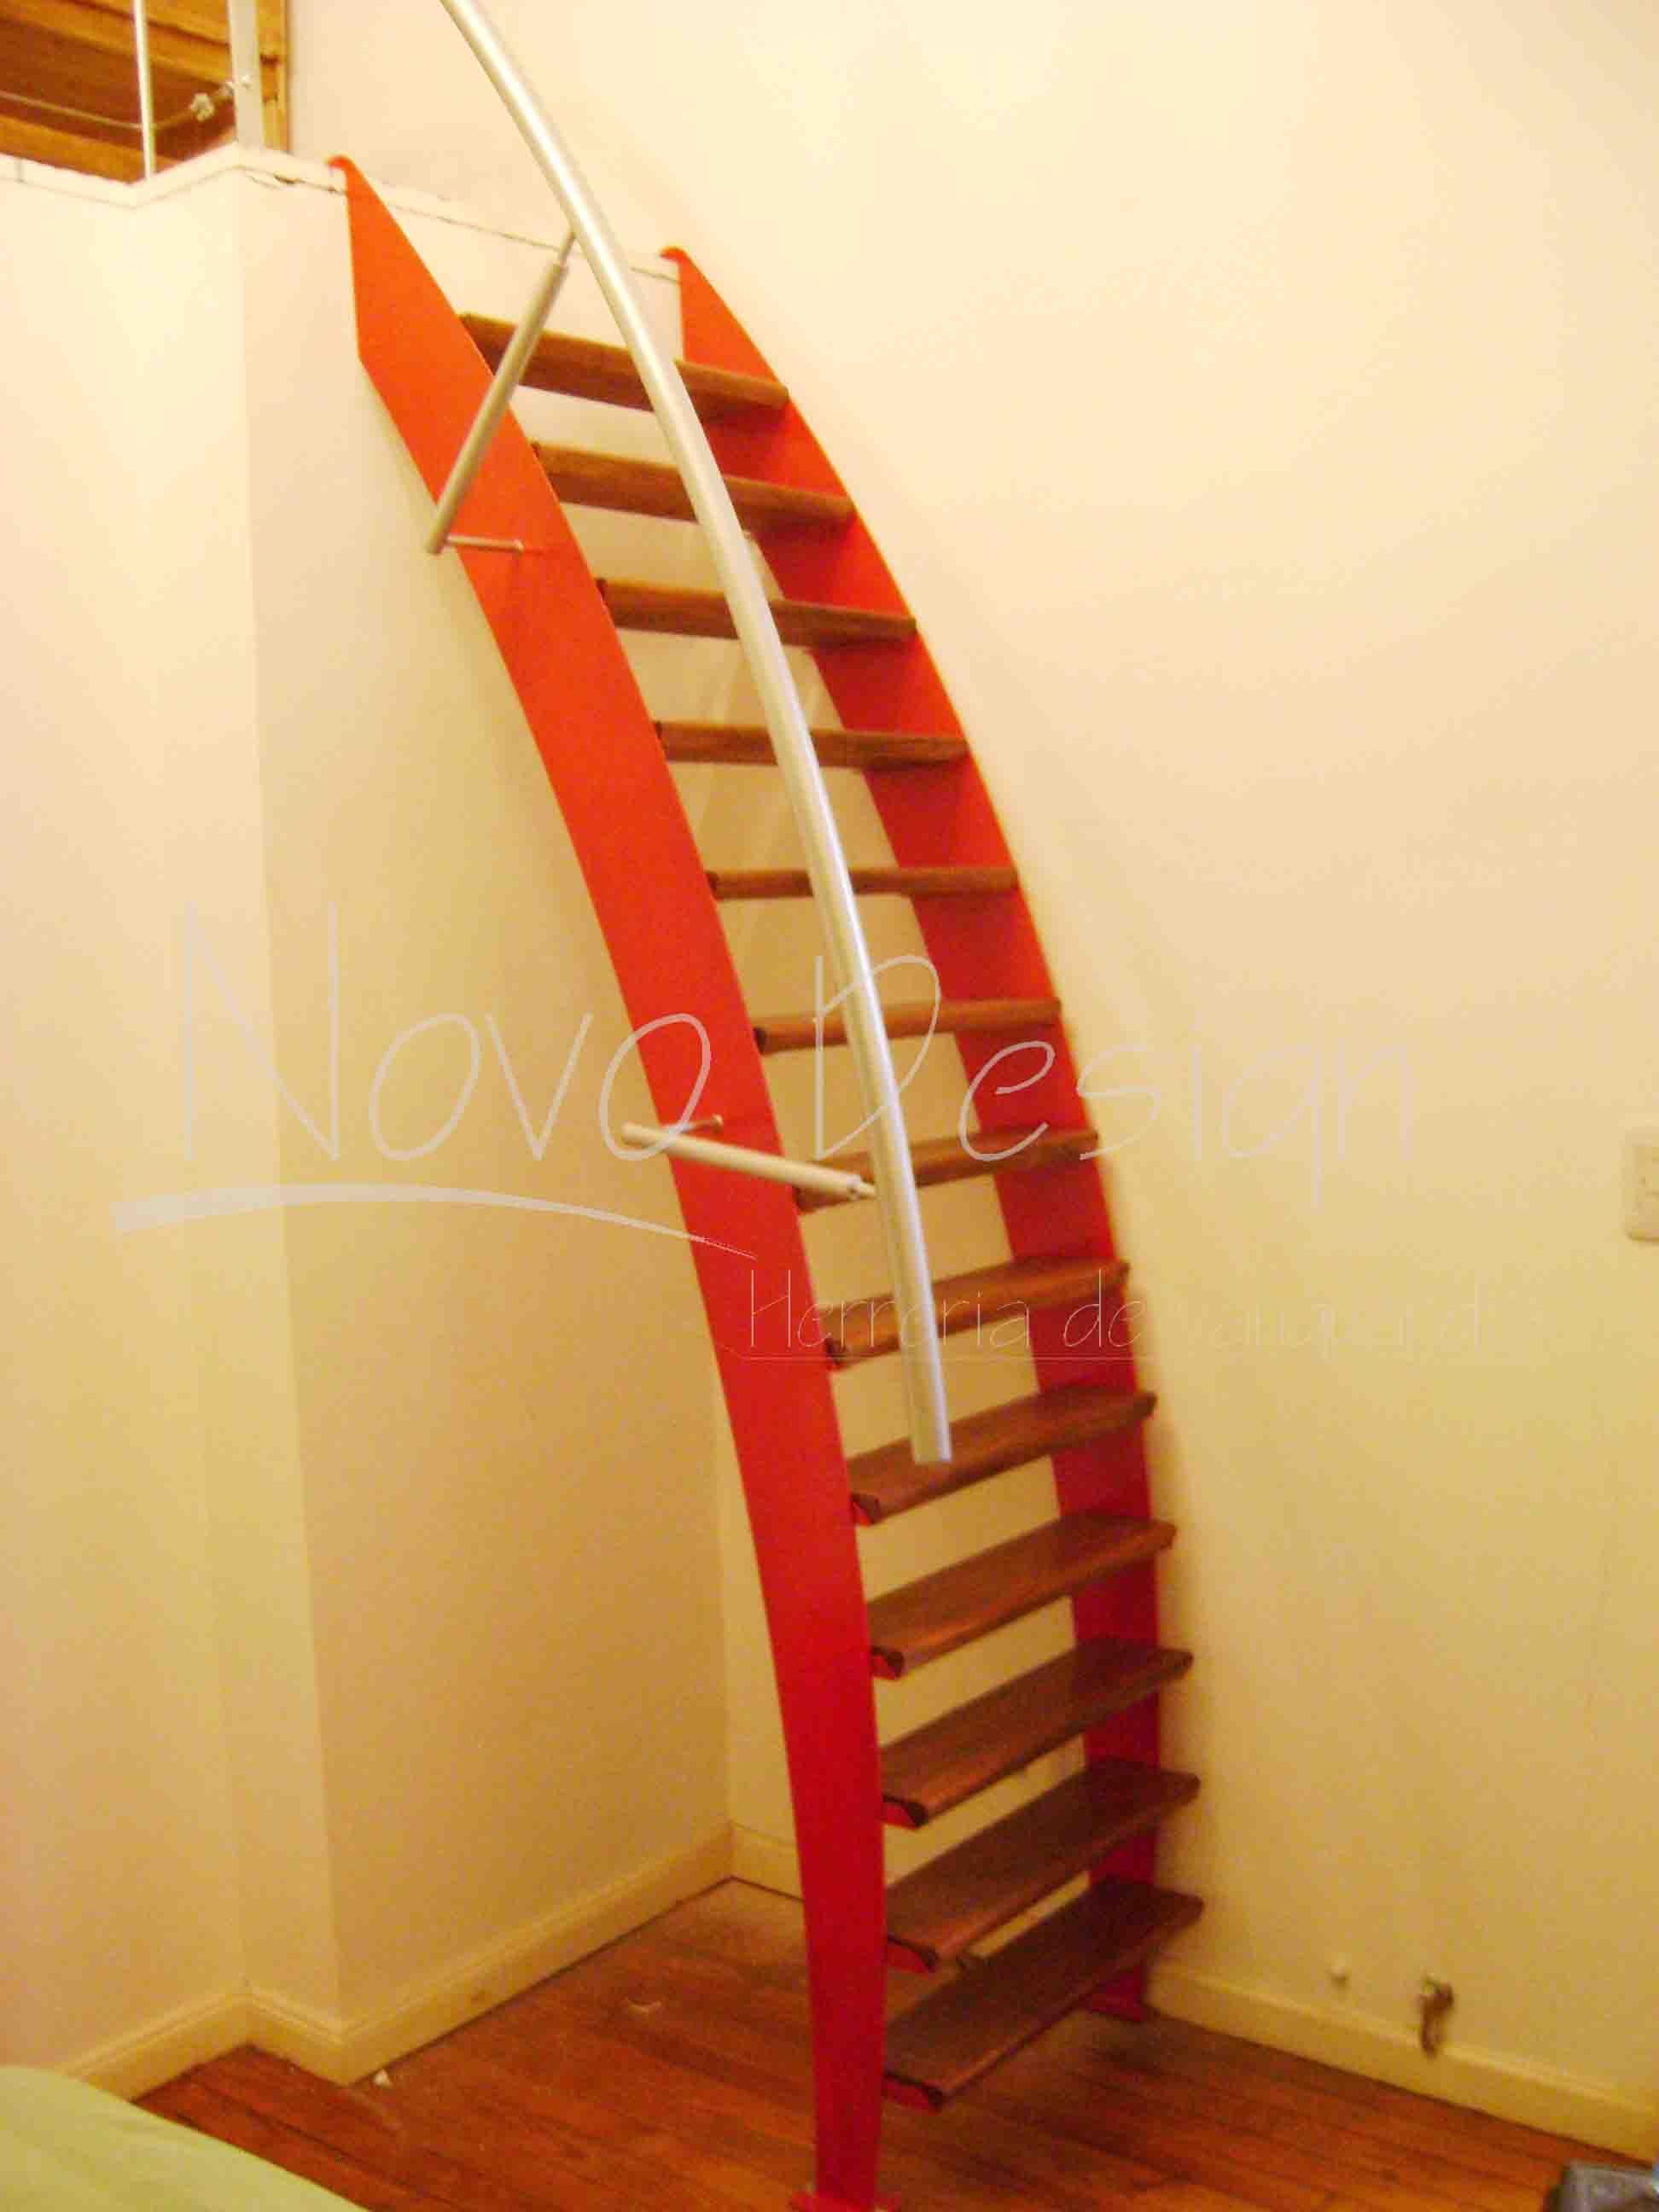 Escaleras exteriores de madera solo metal larguero y for Modelos de escaleras exteriores